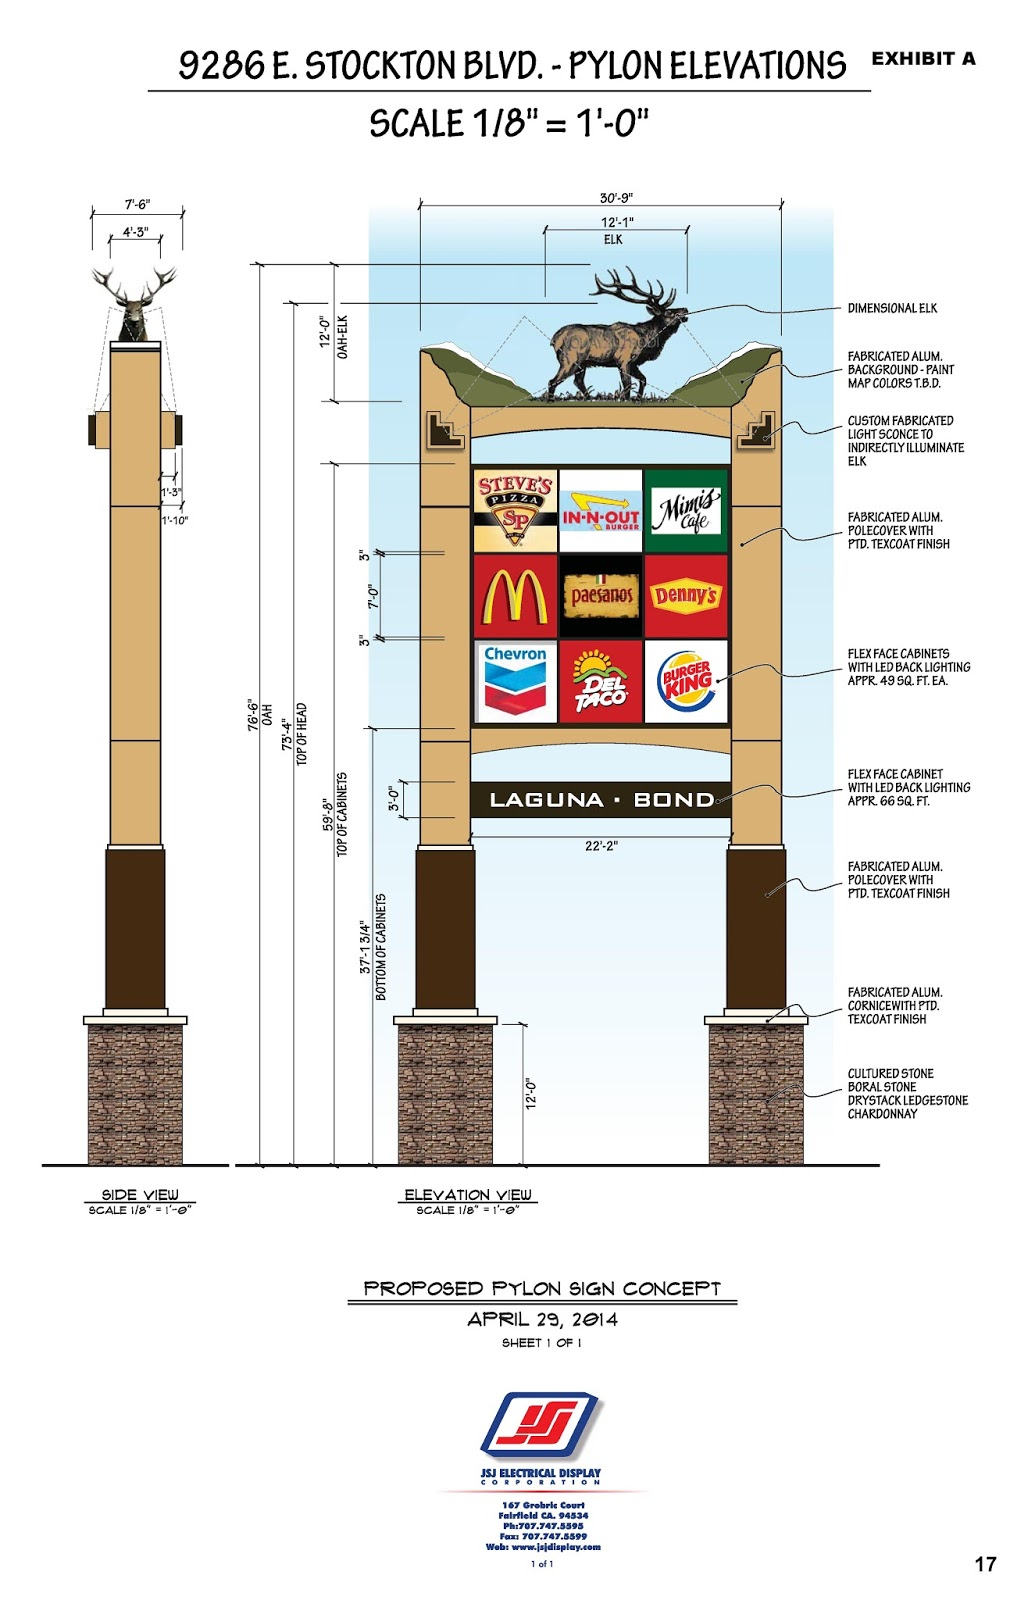 Elk Grove Vw >> Elk Grove Planning Commission to Consider 75' High Billboard | Elk Grove News.net